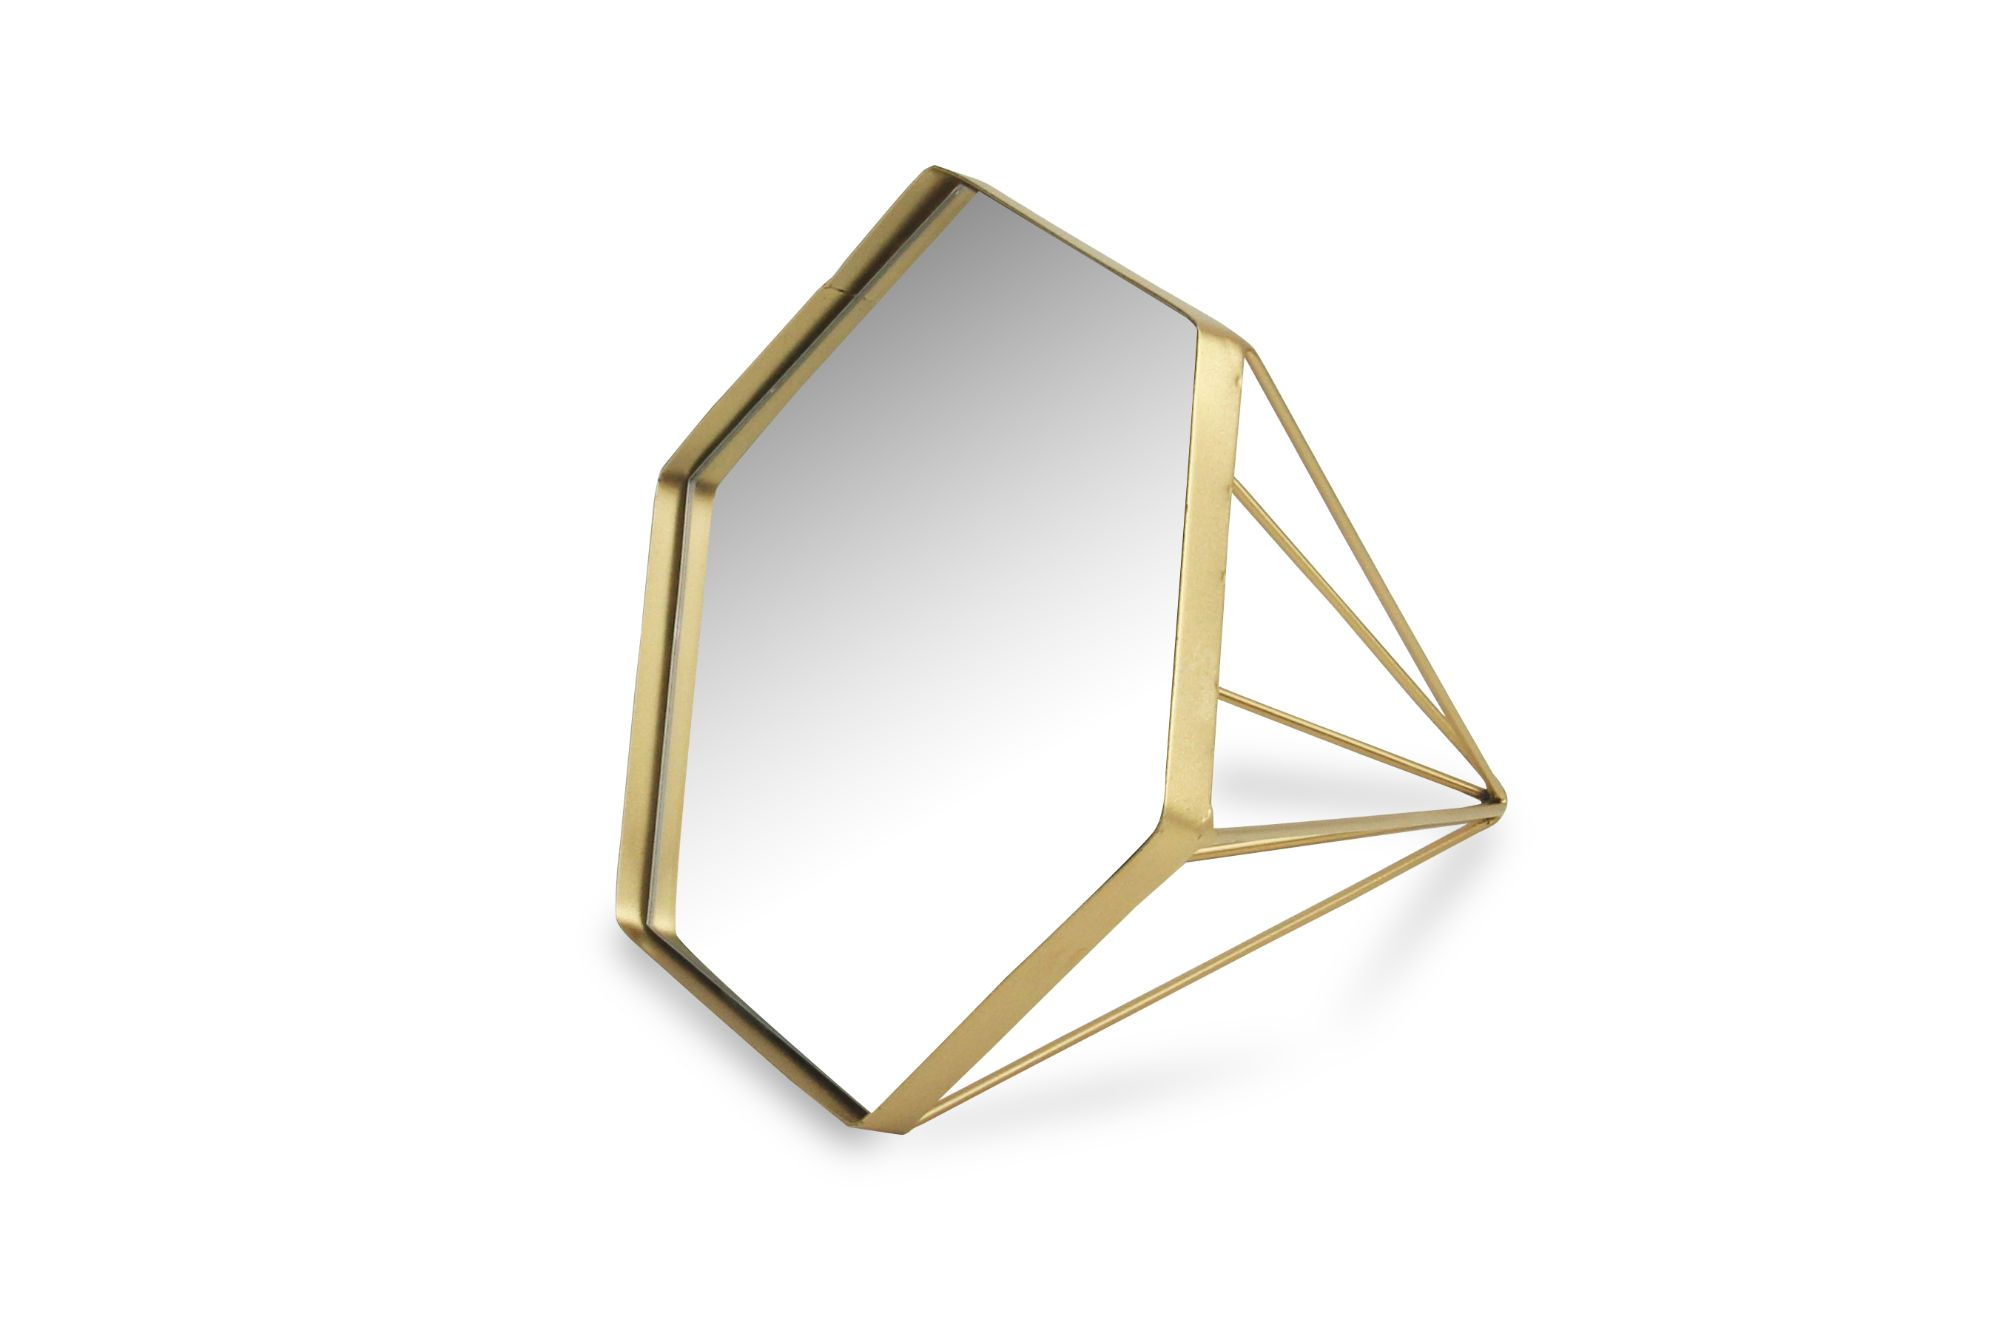 Cheungs 5409 Metal Diamond Shaped Mirror 44 Gold Walmart Com Walmart Com